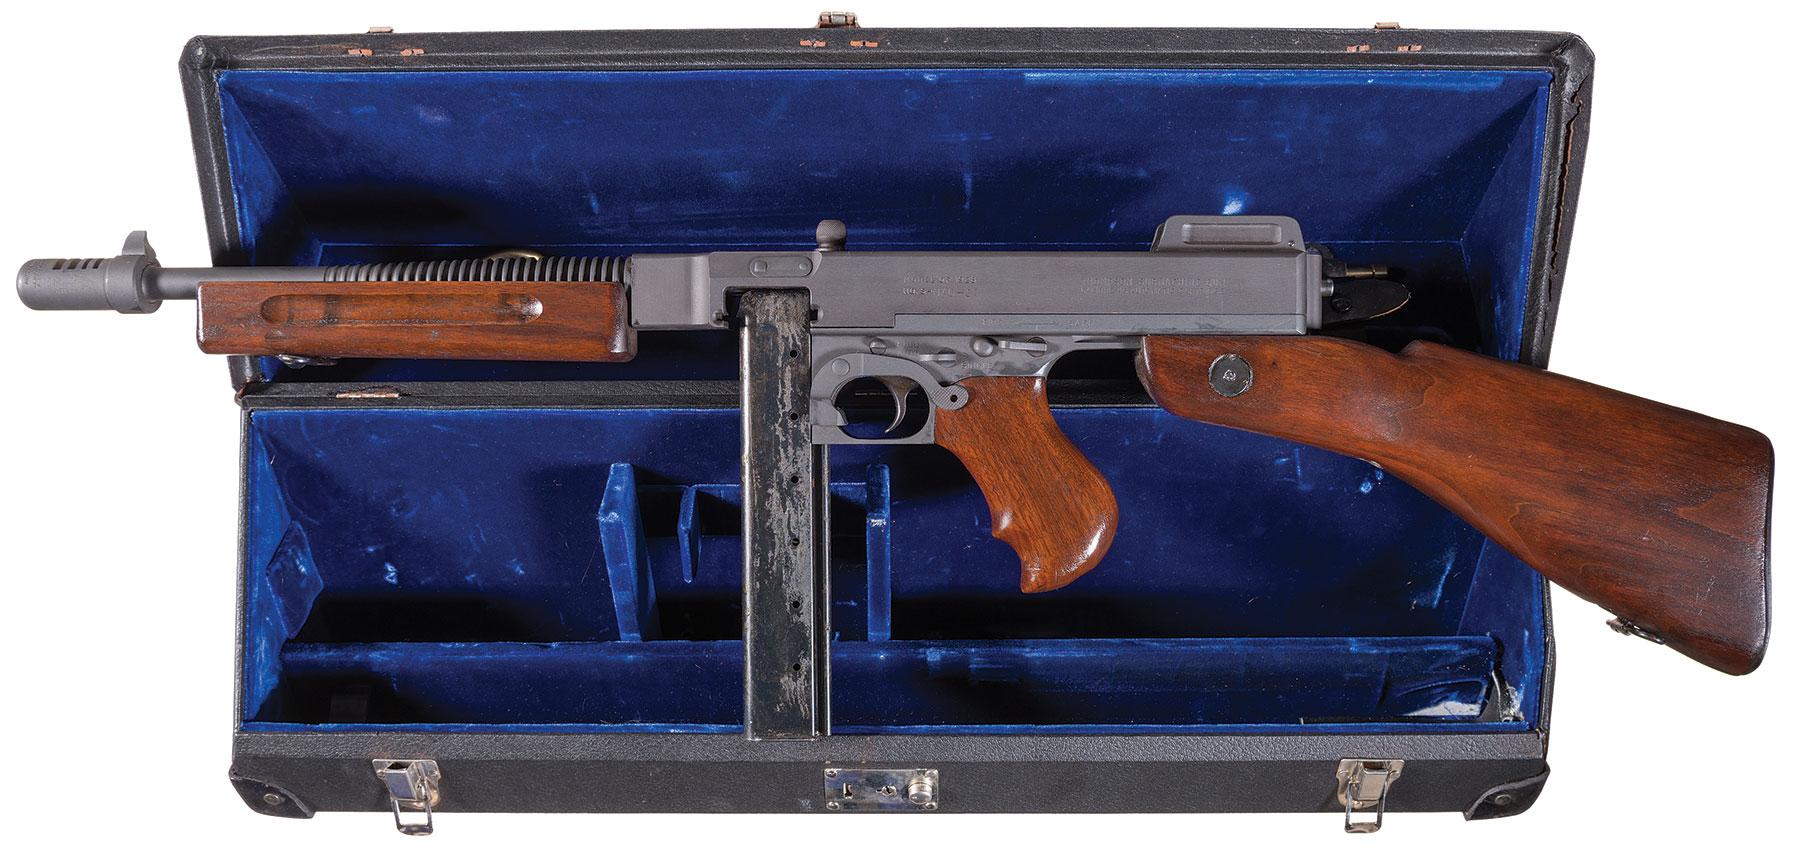 Savage/NAC Class III/NFA Model 1928 Thompson SMG